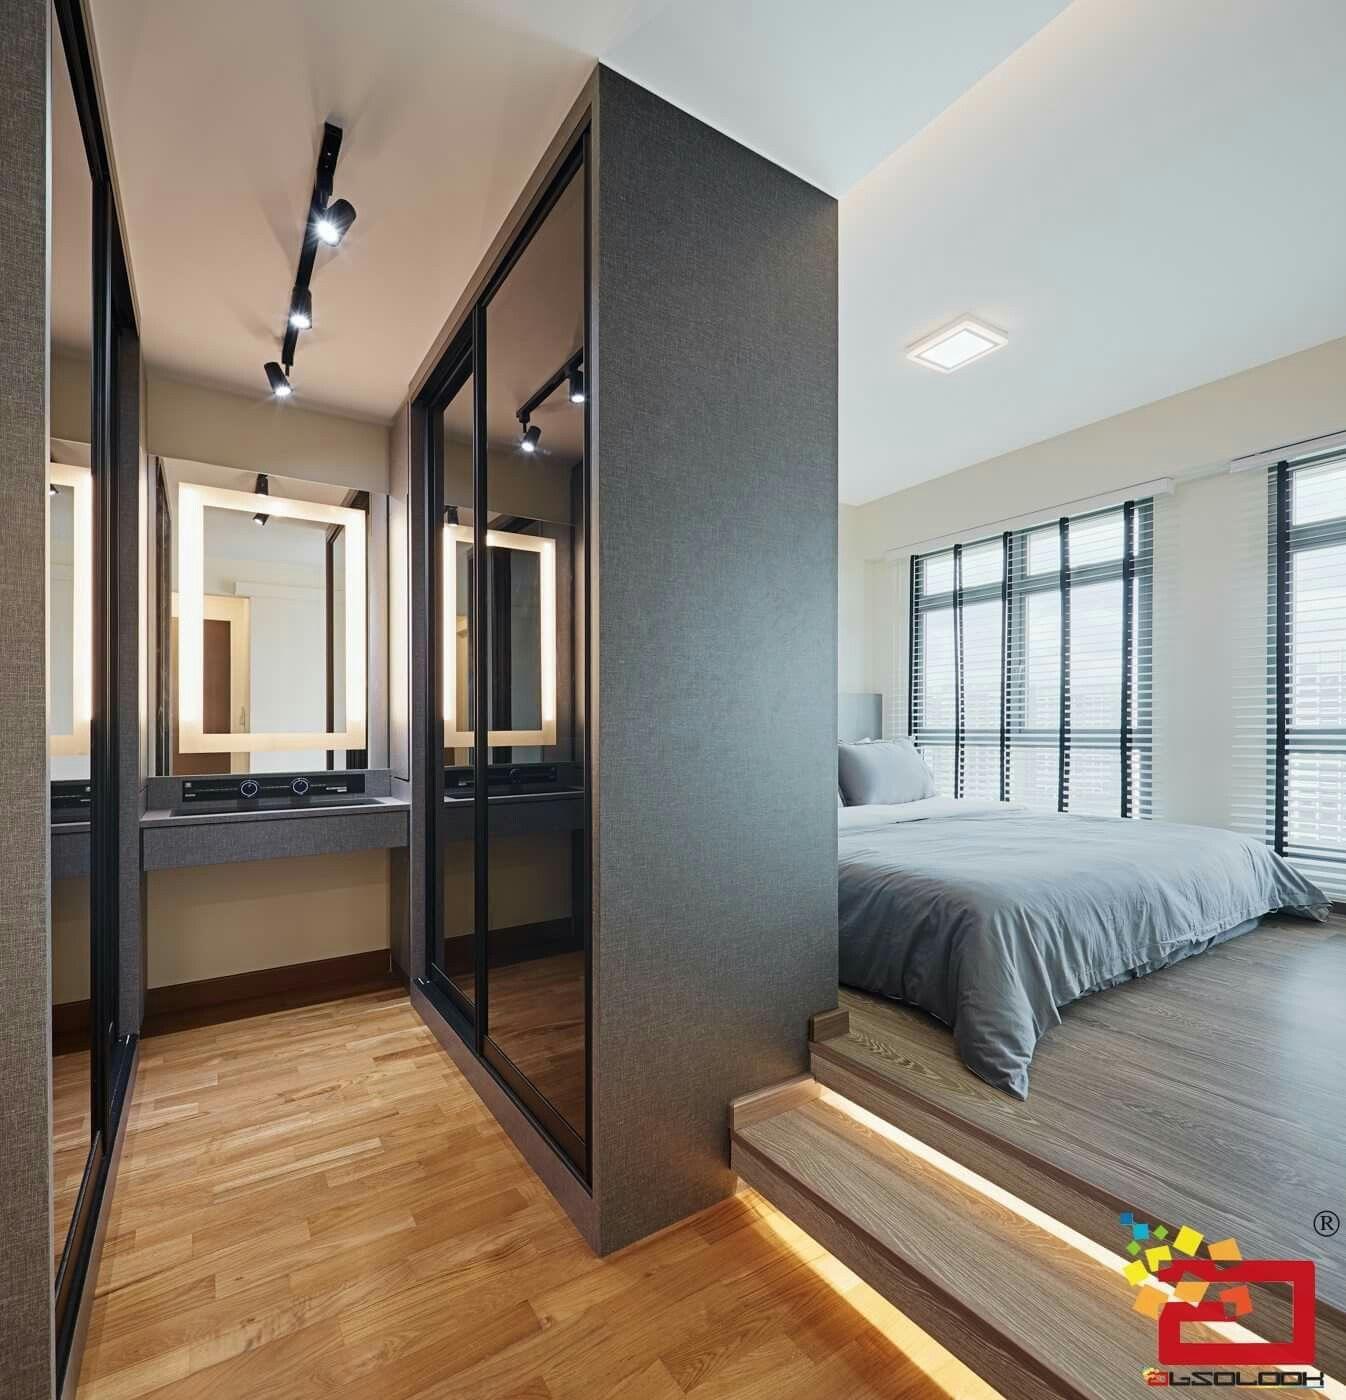 4 room bto master bedroom  Pin by Najla Fullstop on Yass master bedroom  Pinterest  Bedrooms